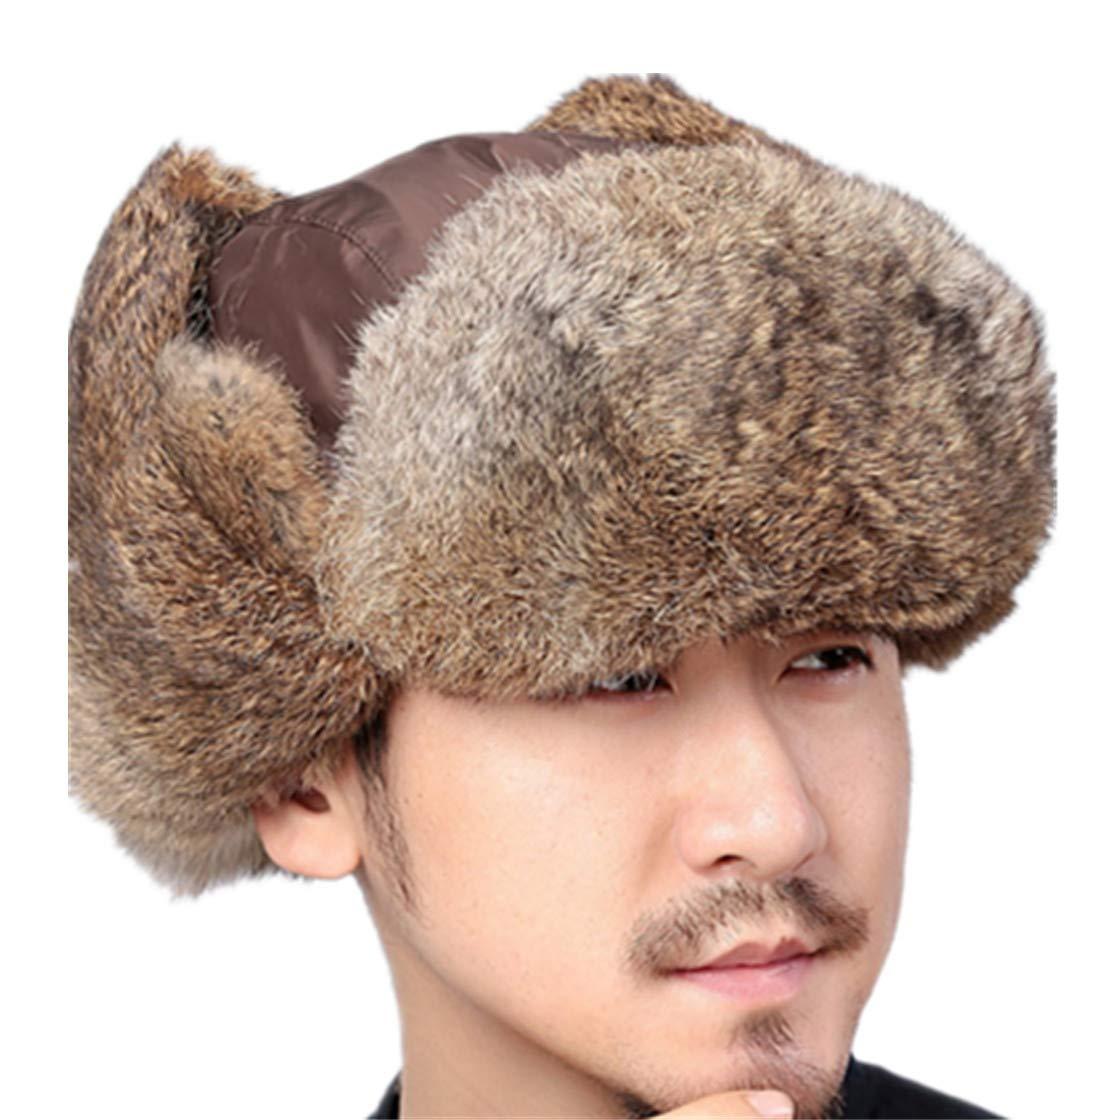 Winter Bomber Hats Rabbit Fur Ushanka Warm Trapper Aviator Hat with Earflaps